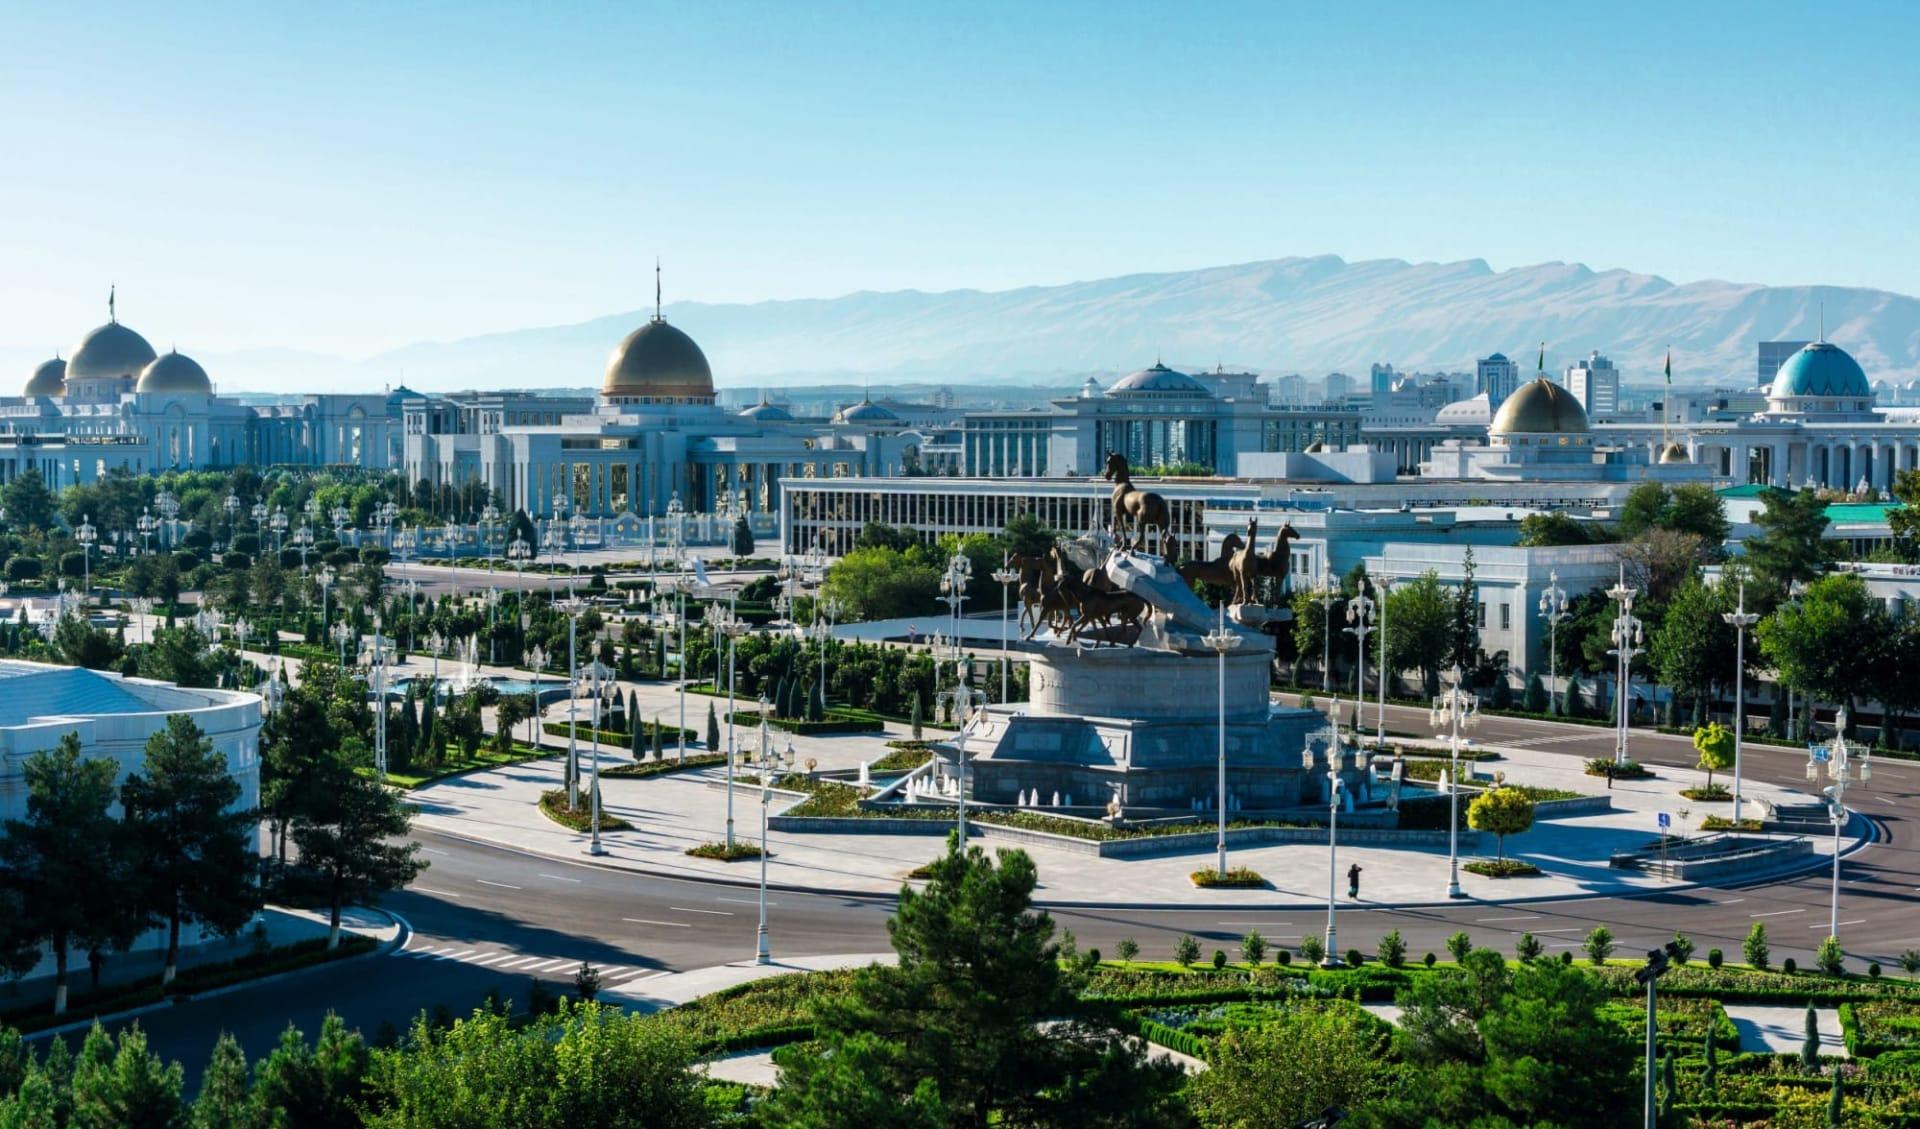 Golden Eagle, Luxuriös entlang der Seidenstrasse ab Peking: Turkmenistan_Aschgabad_Panorama_